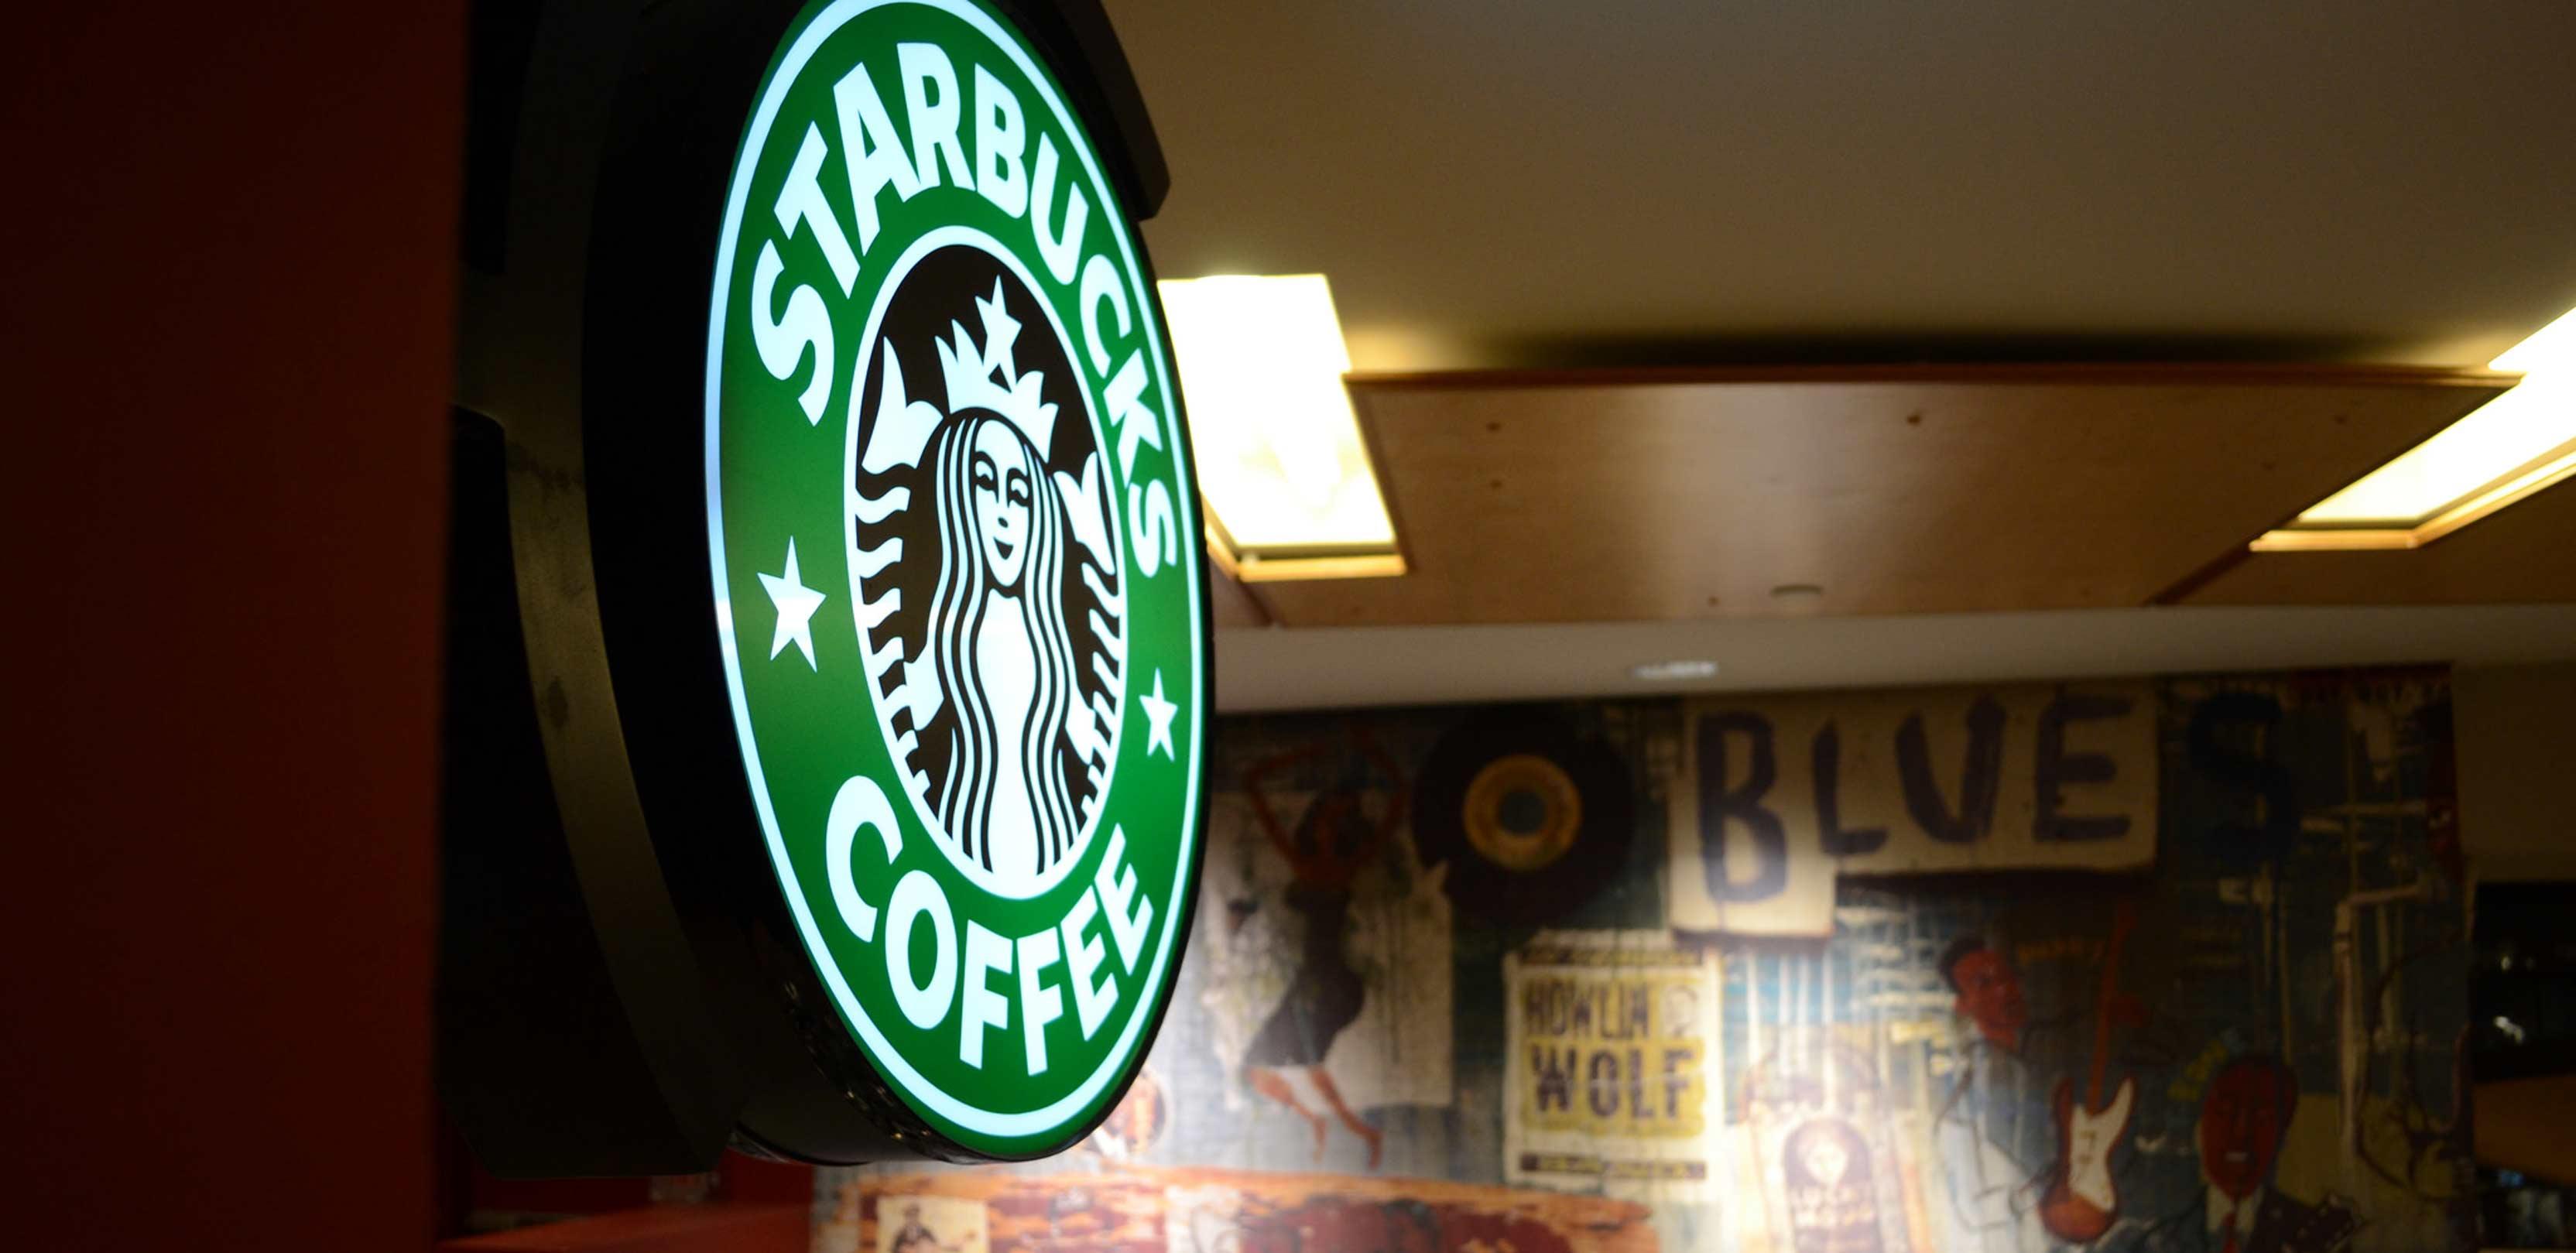 iMessage Starbucks